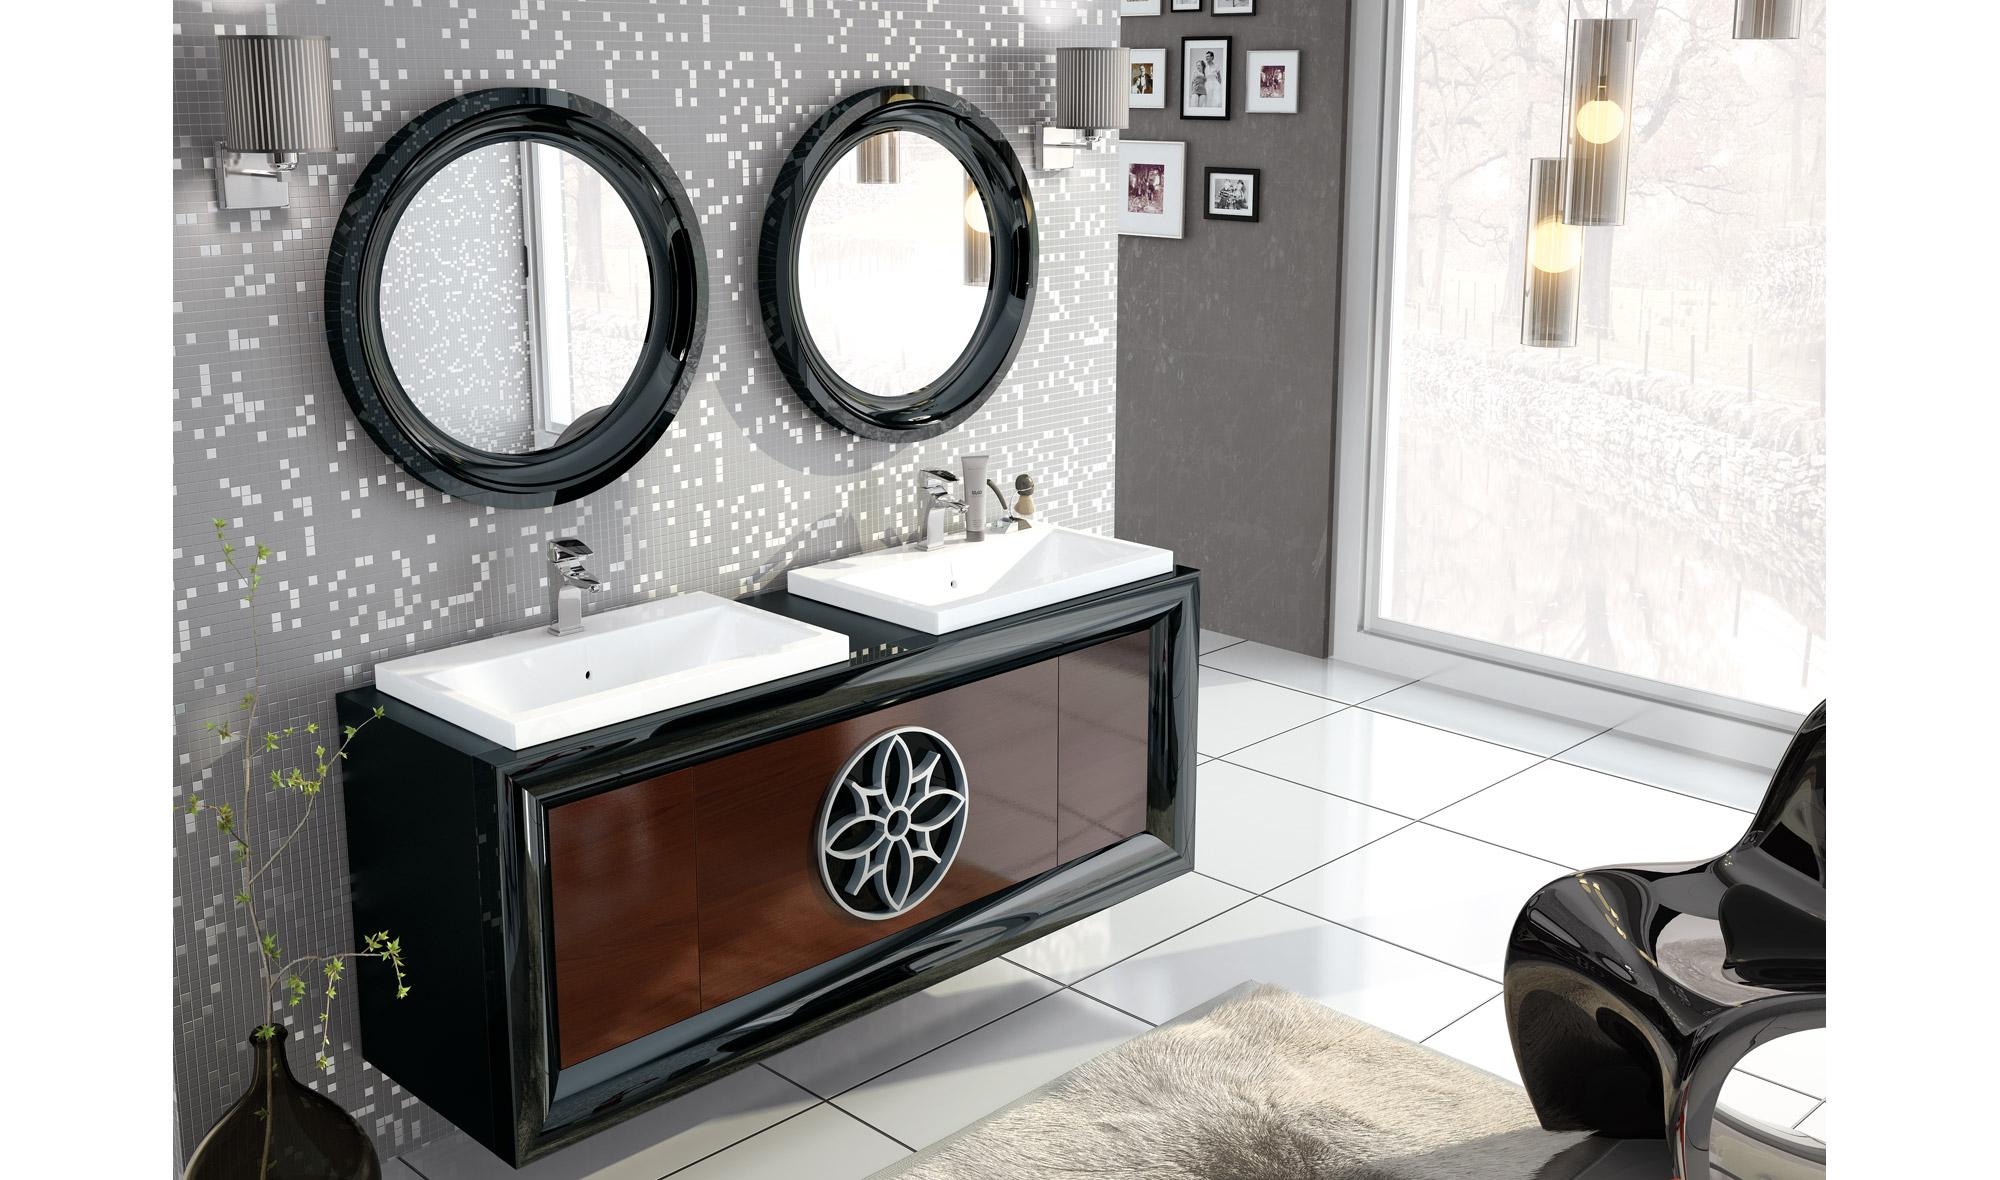 Muebles De Baño Nou Decor:Mueble de baño design Bouier en Portobellostreetes